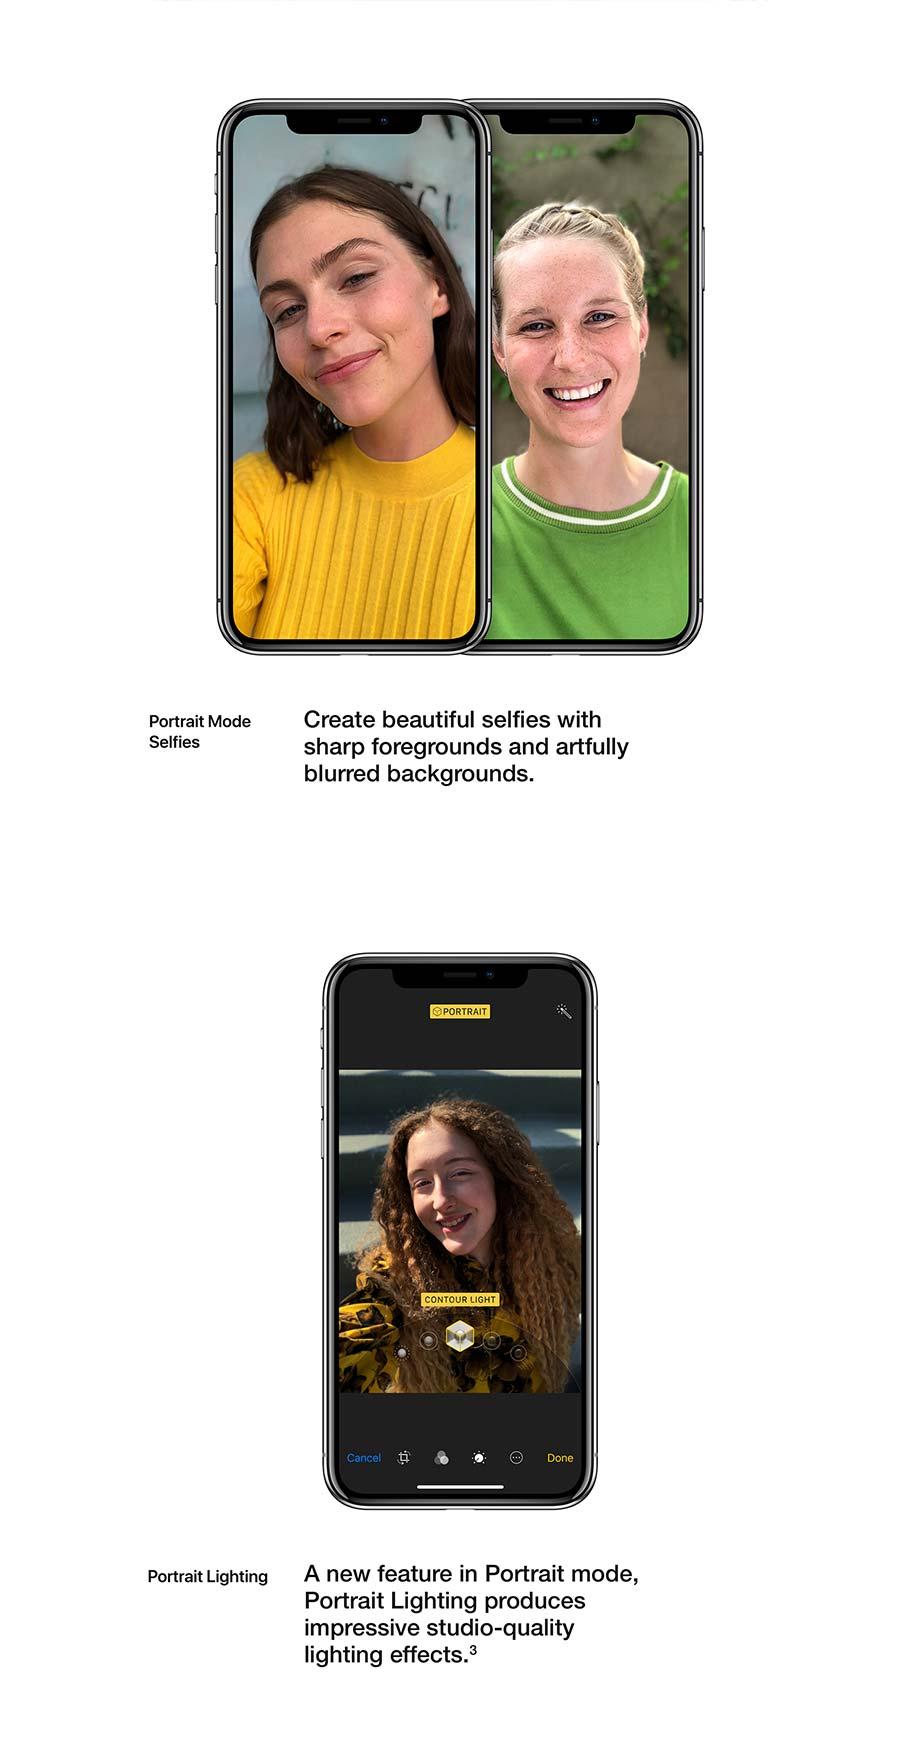 Portrait Mode Selfies, Portrait Lighting